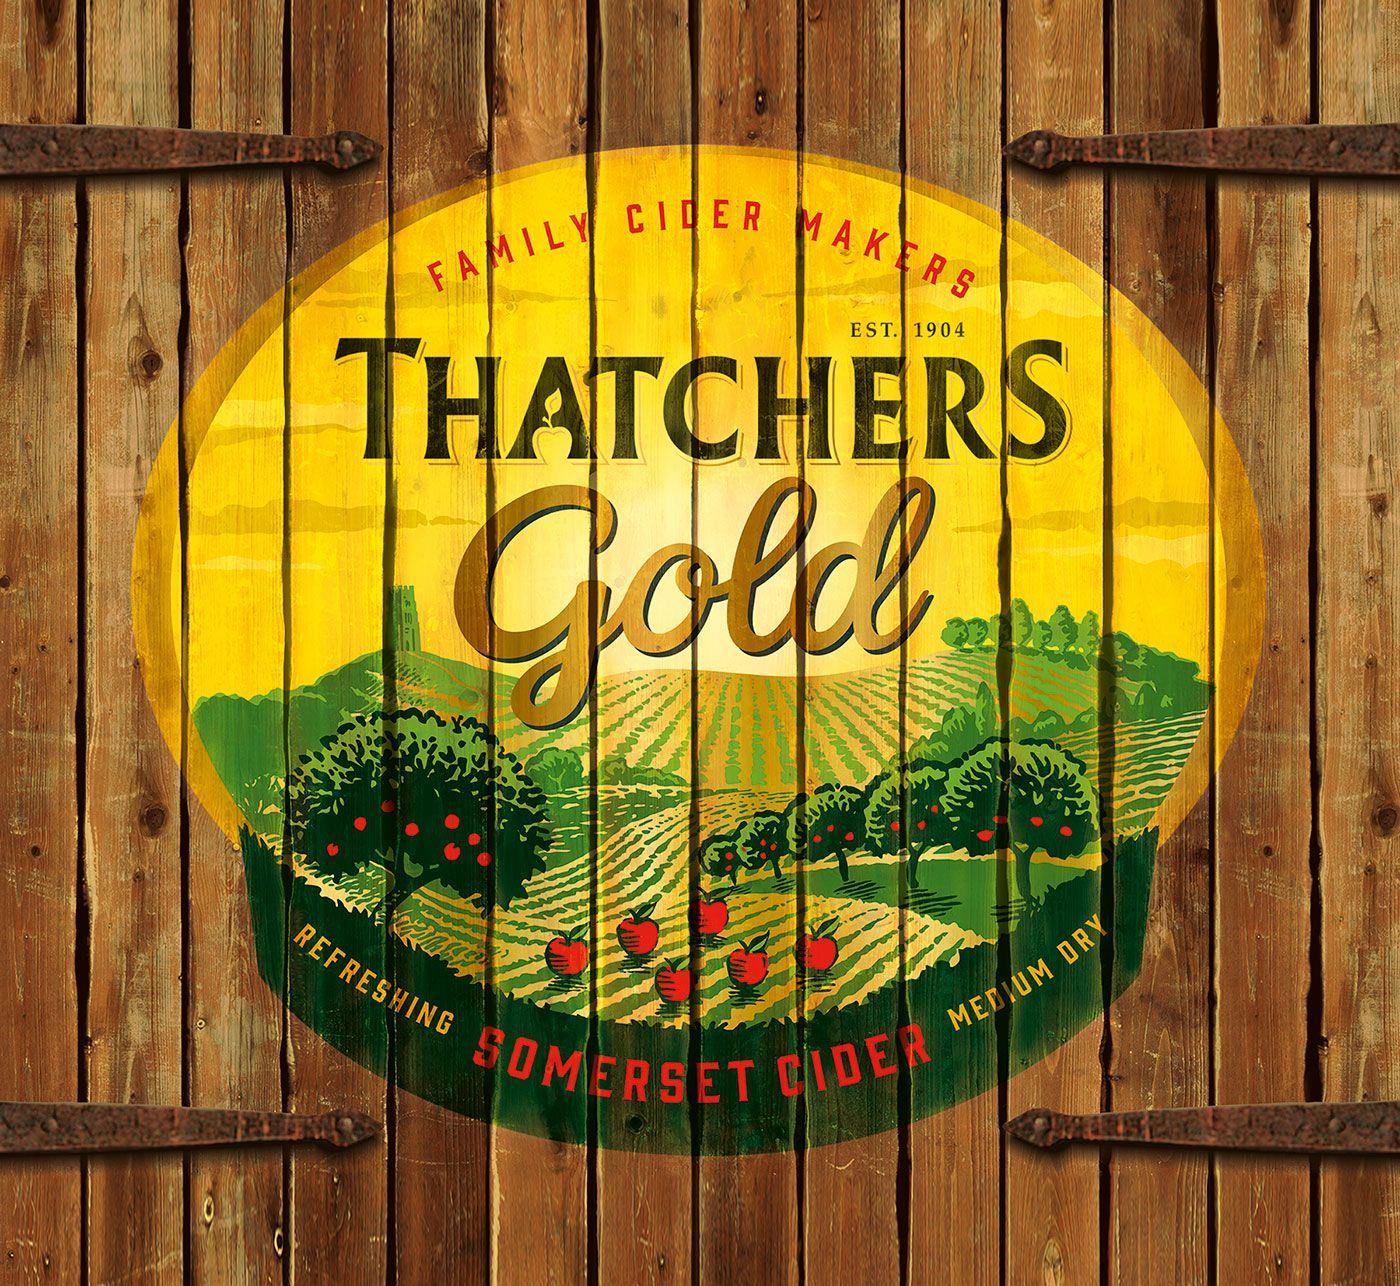 Pin on Thatchers Cider cake